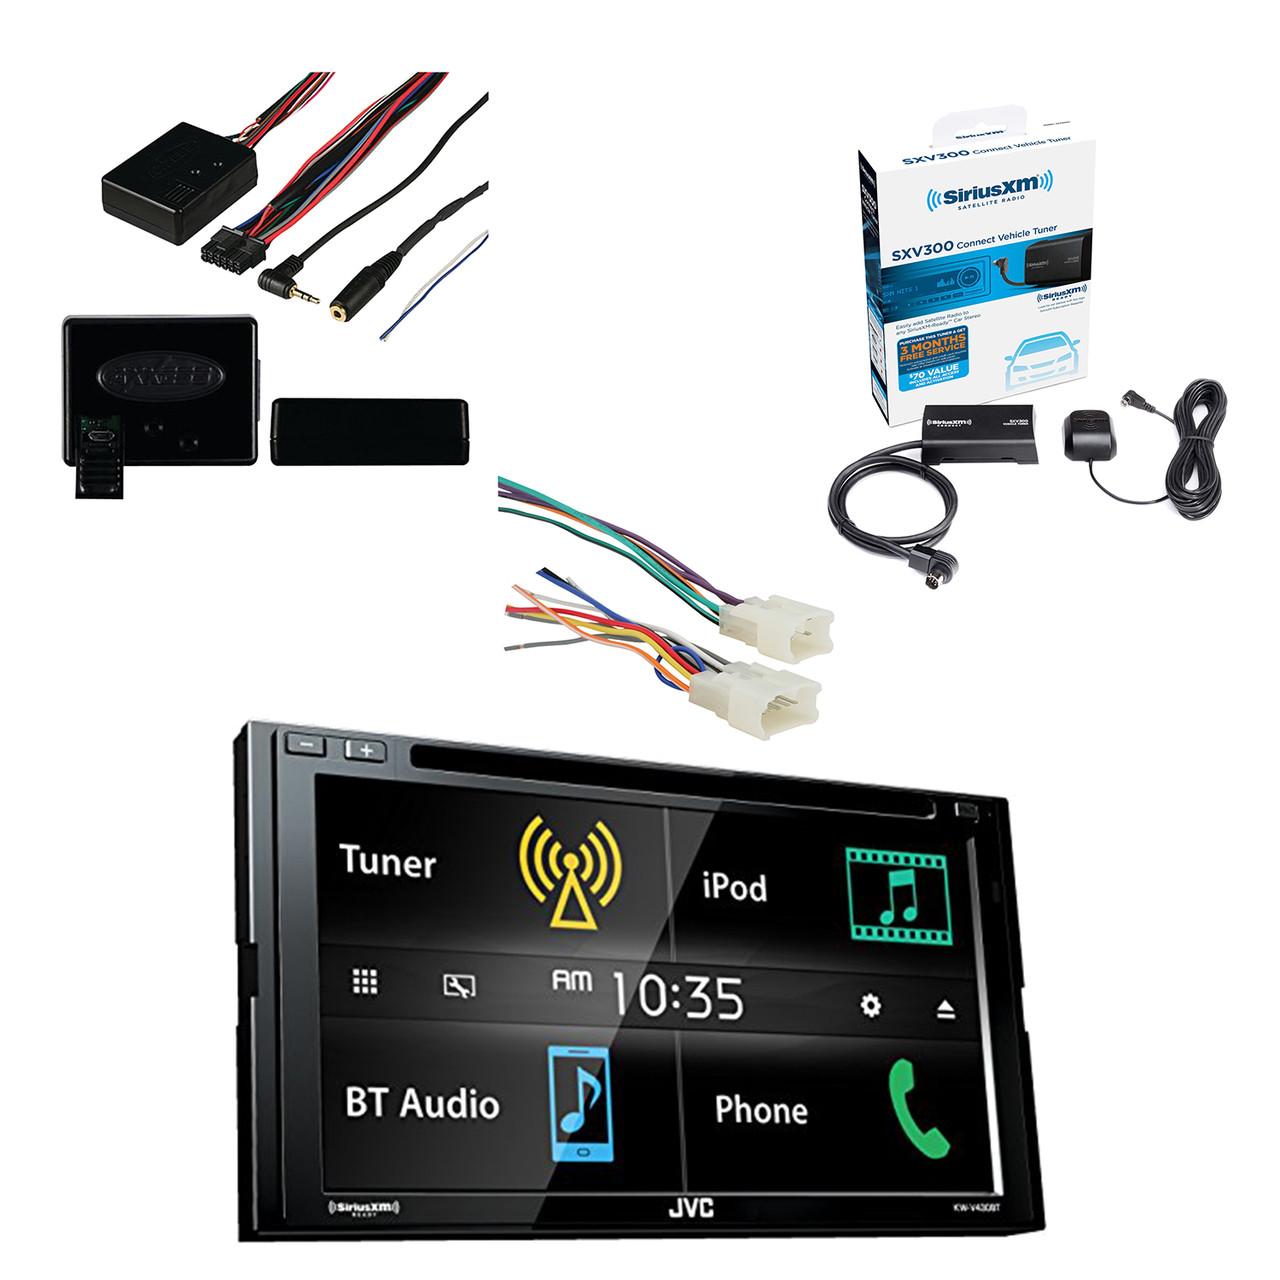 Kicker Bluetooth Amplifier Flhx Dash Adapter Kit Xm Tuner Universal Car Radio Wiring Enrockautomotive